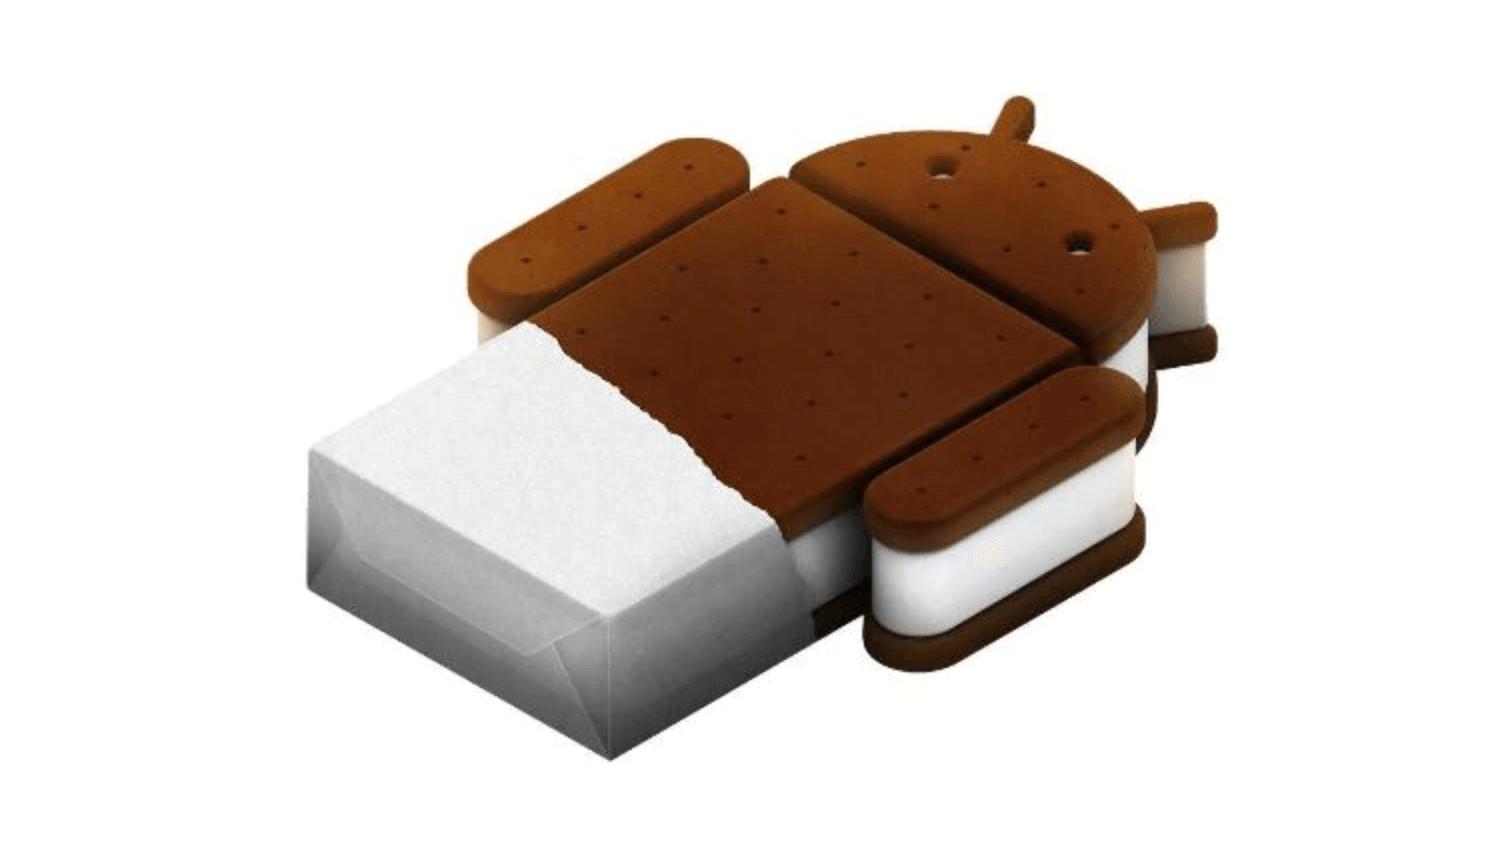 Ice Cream Sandwich 4.0